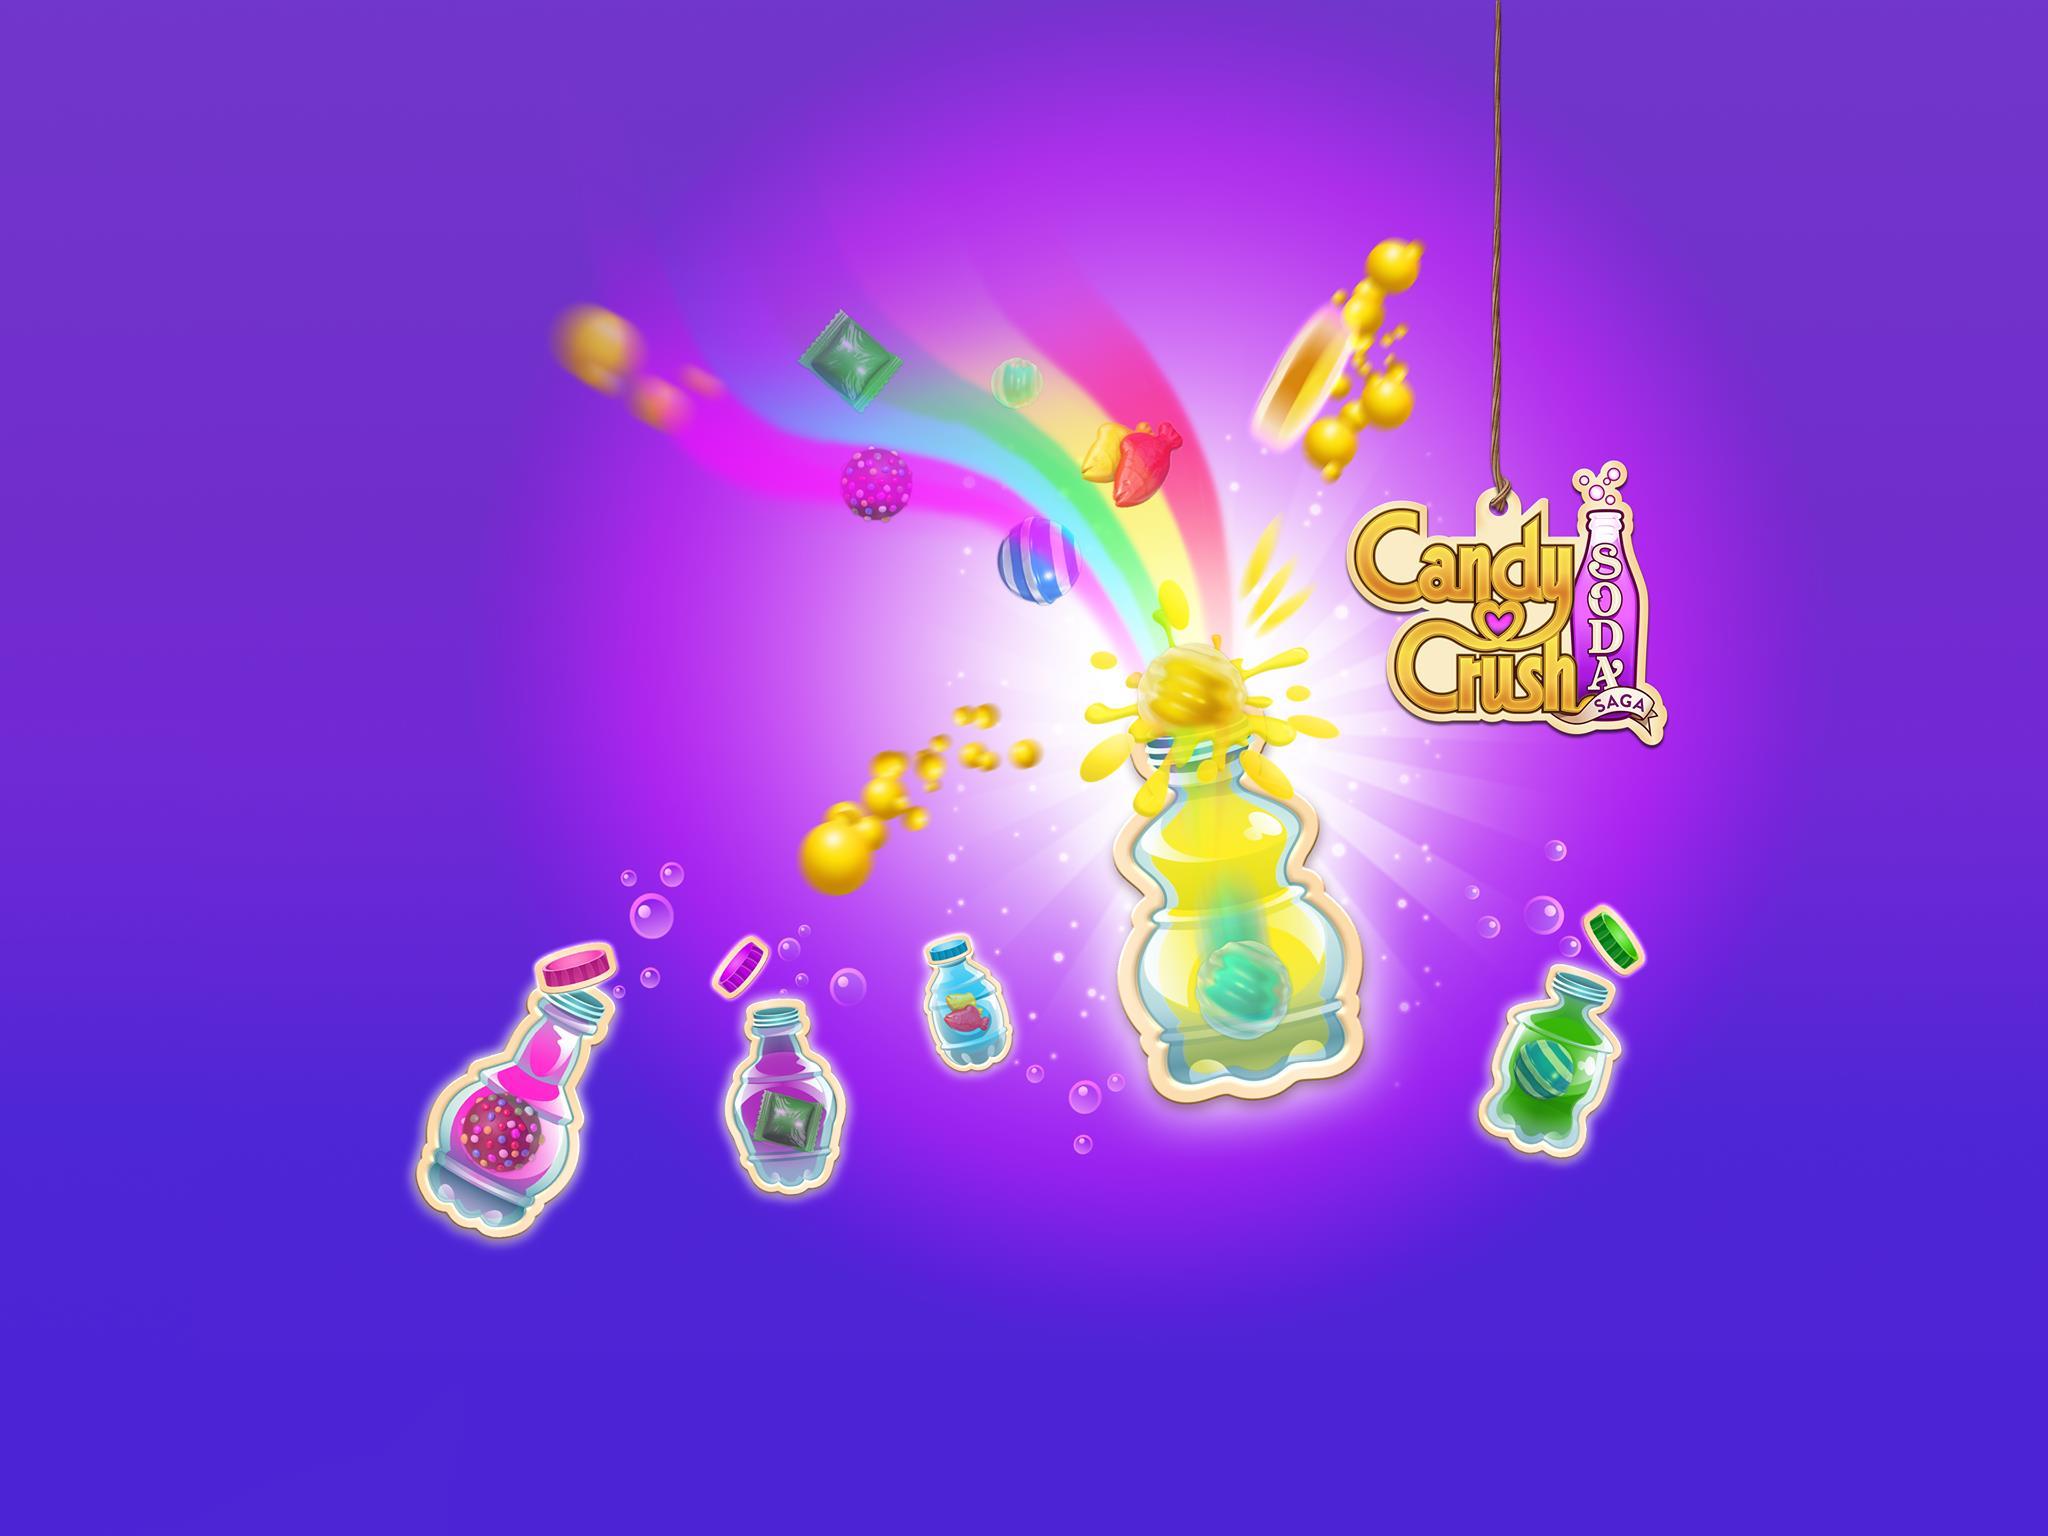 Rainbow Streak Promotional Art